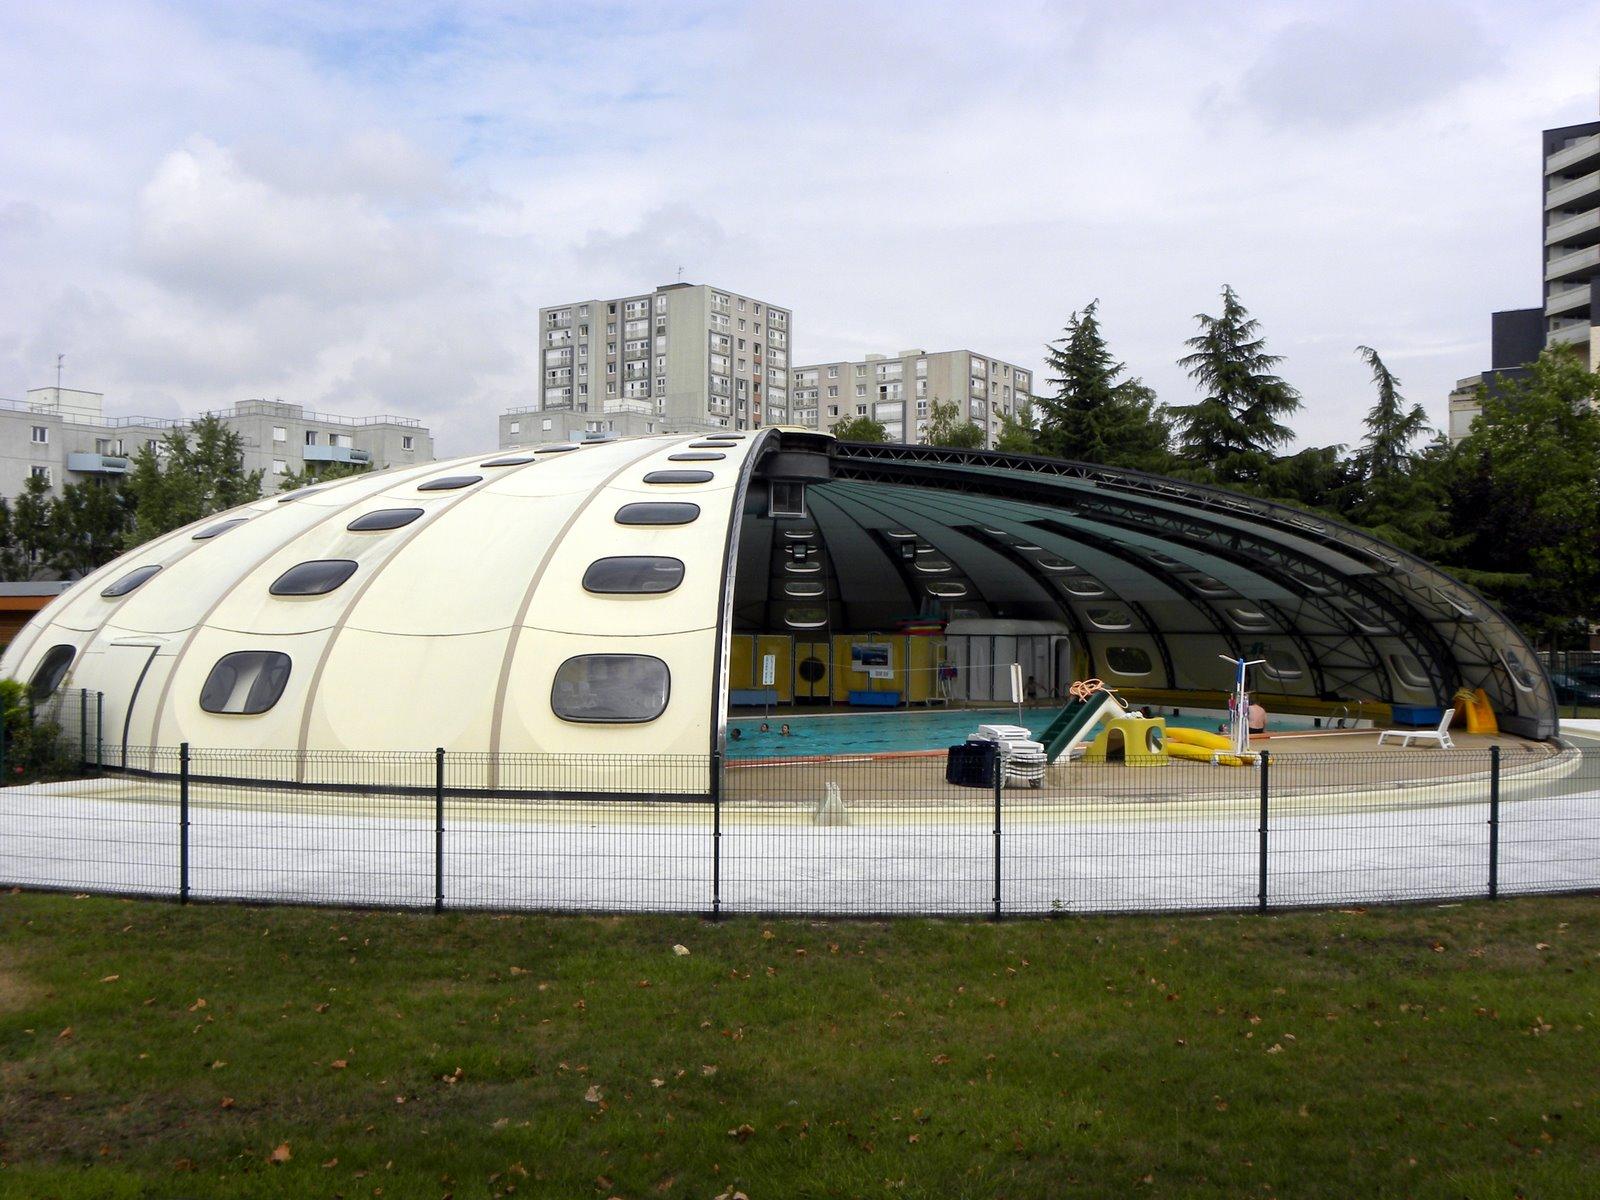 Quevilly espace images petit quevilly piscine municipale for Piscine grand quevilly